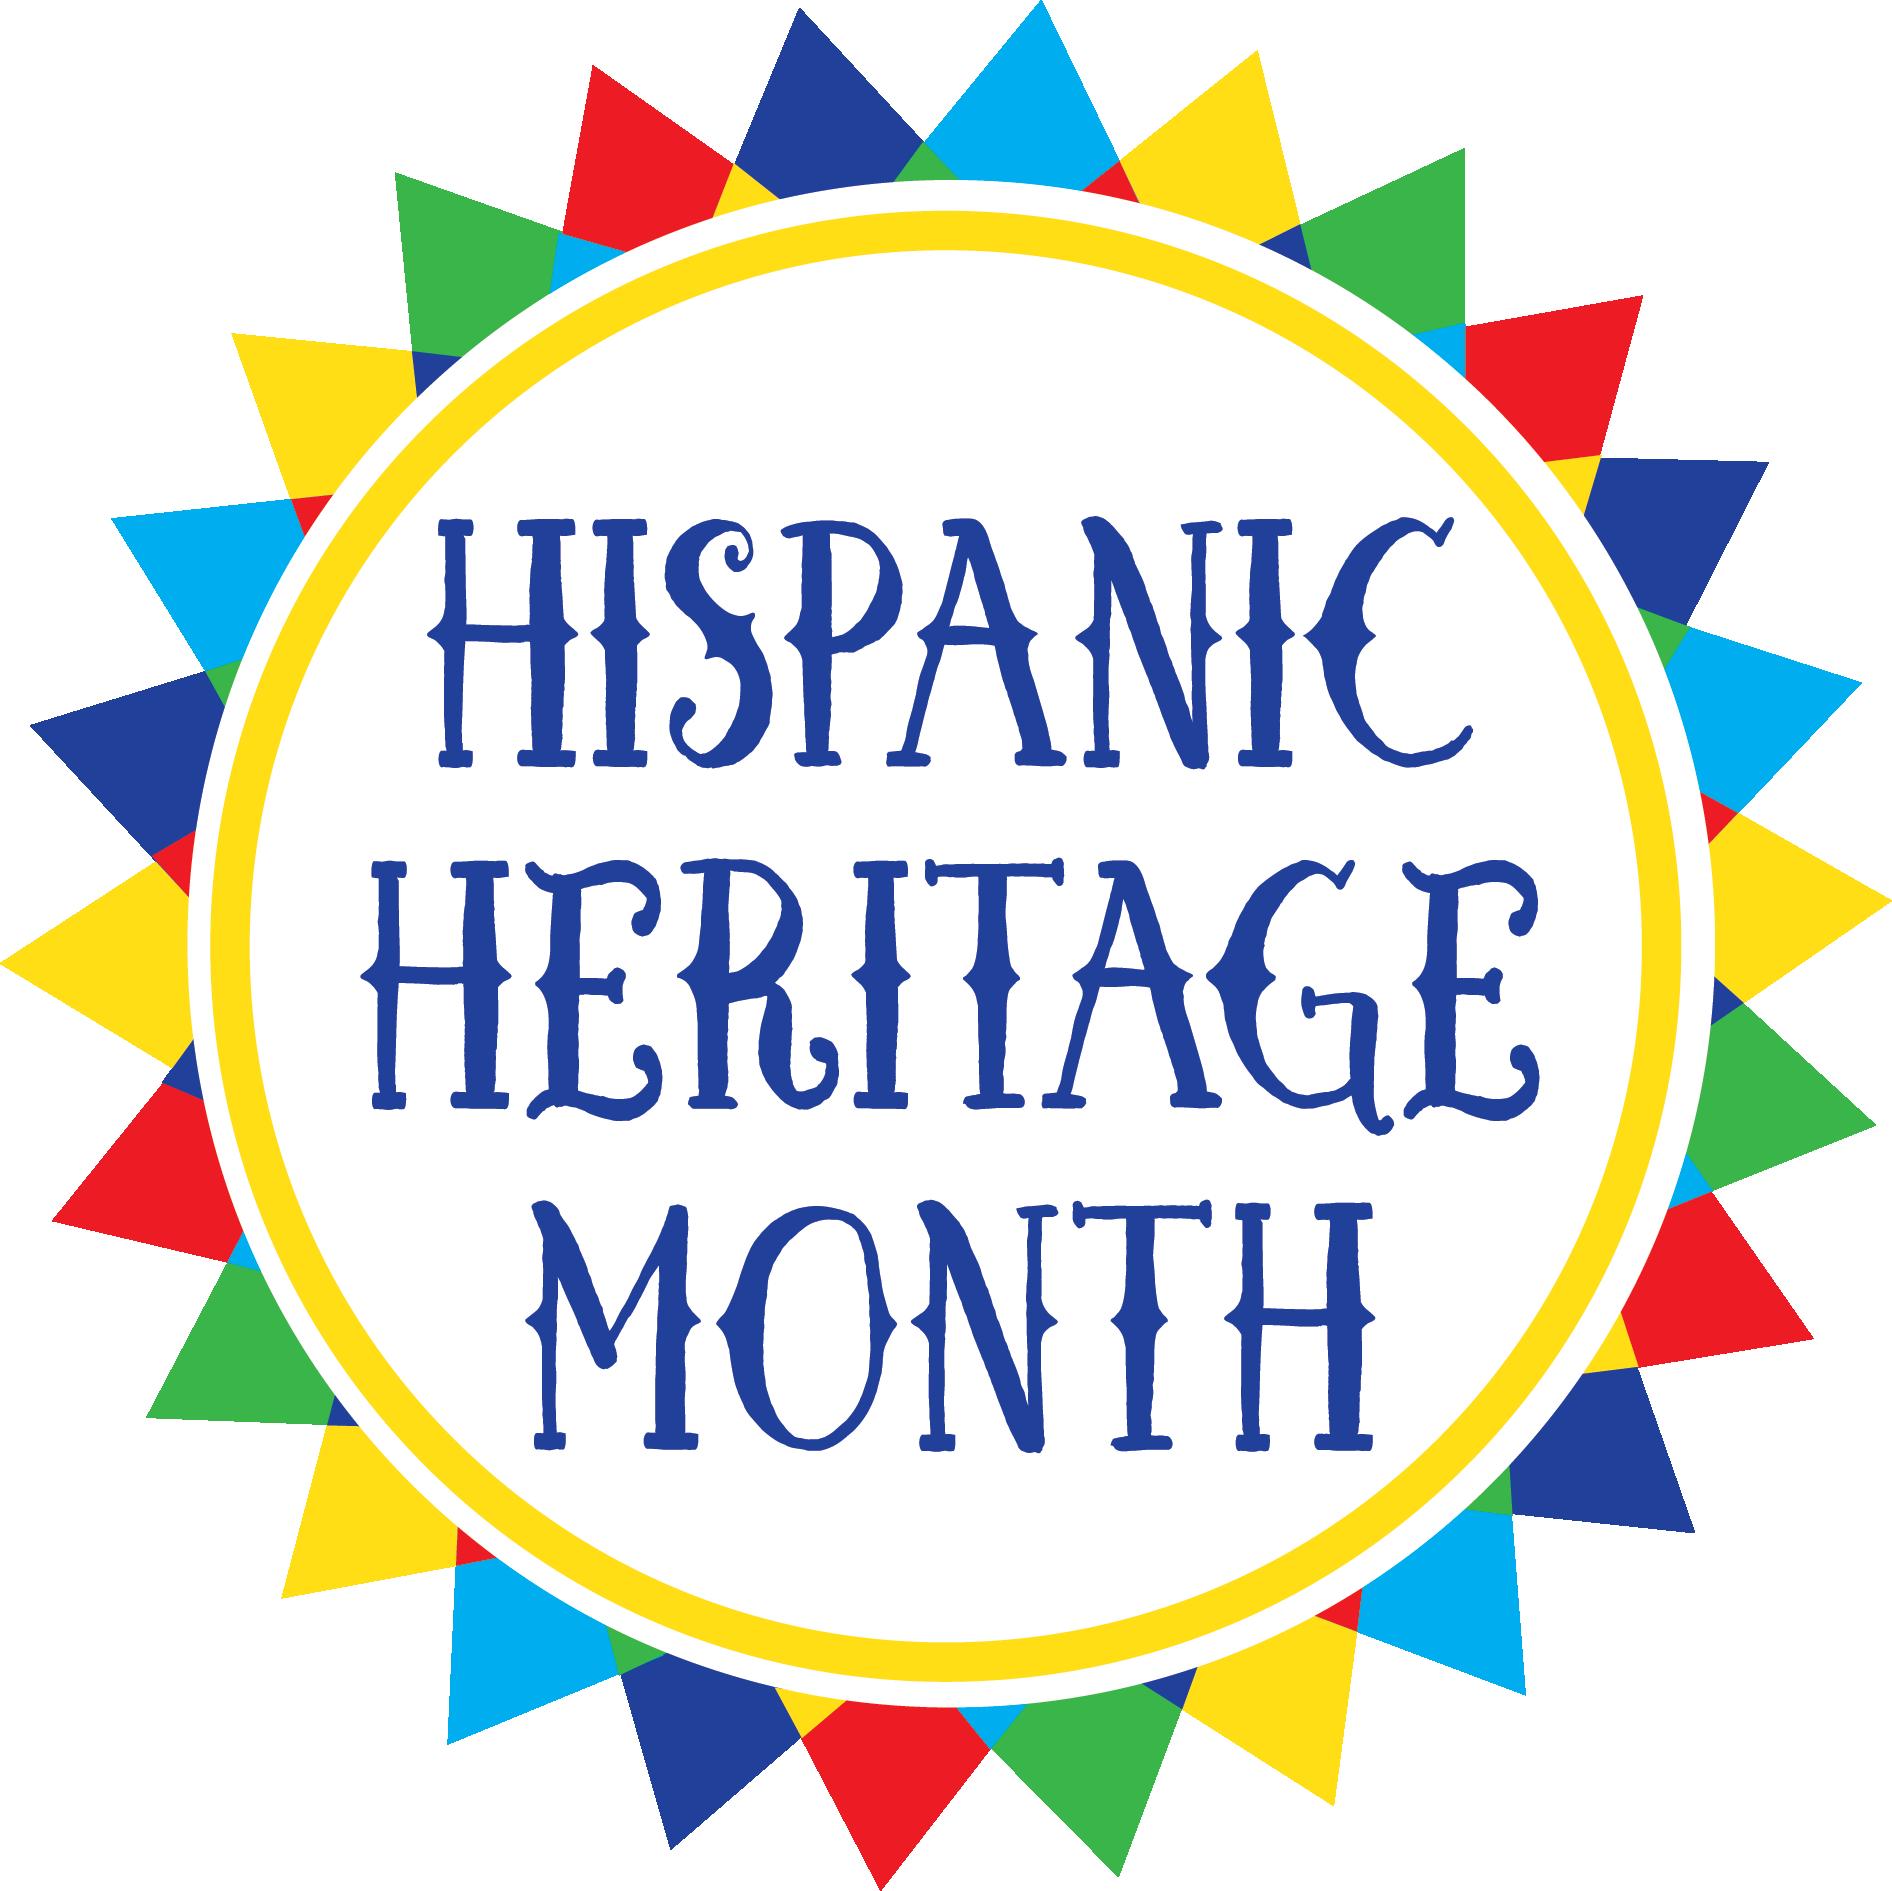 Hispanic Heritage Month By Hispanic Heritage Month On